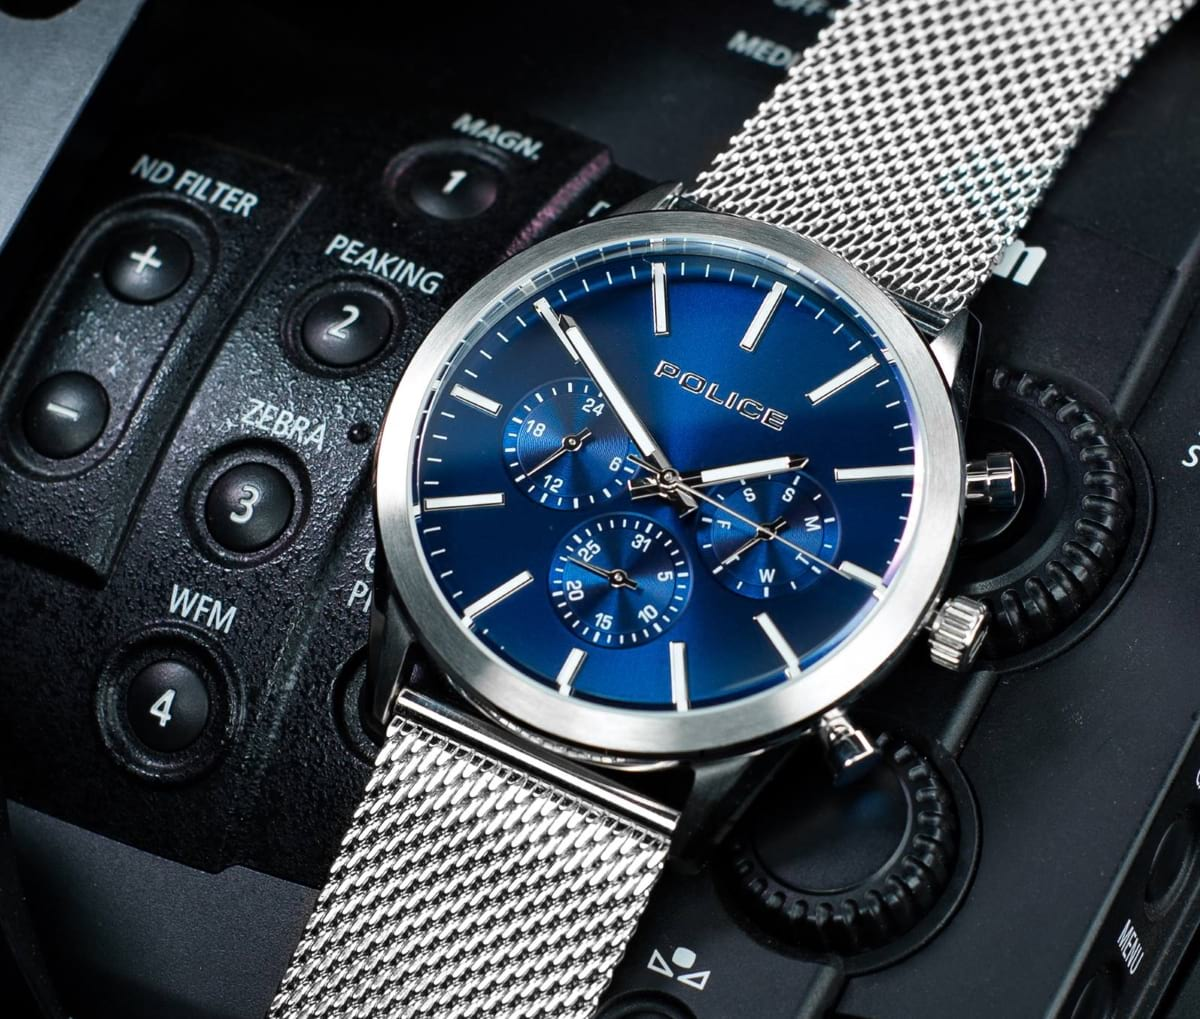 Relógio Patriot da Police